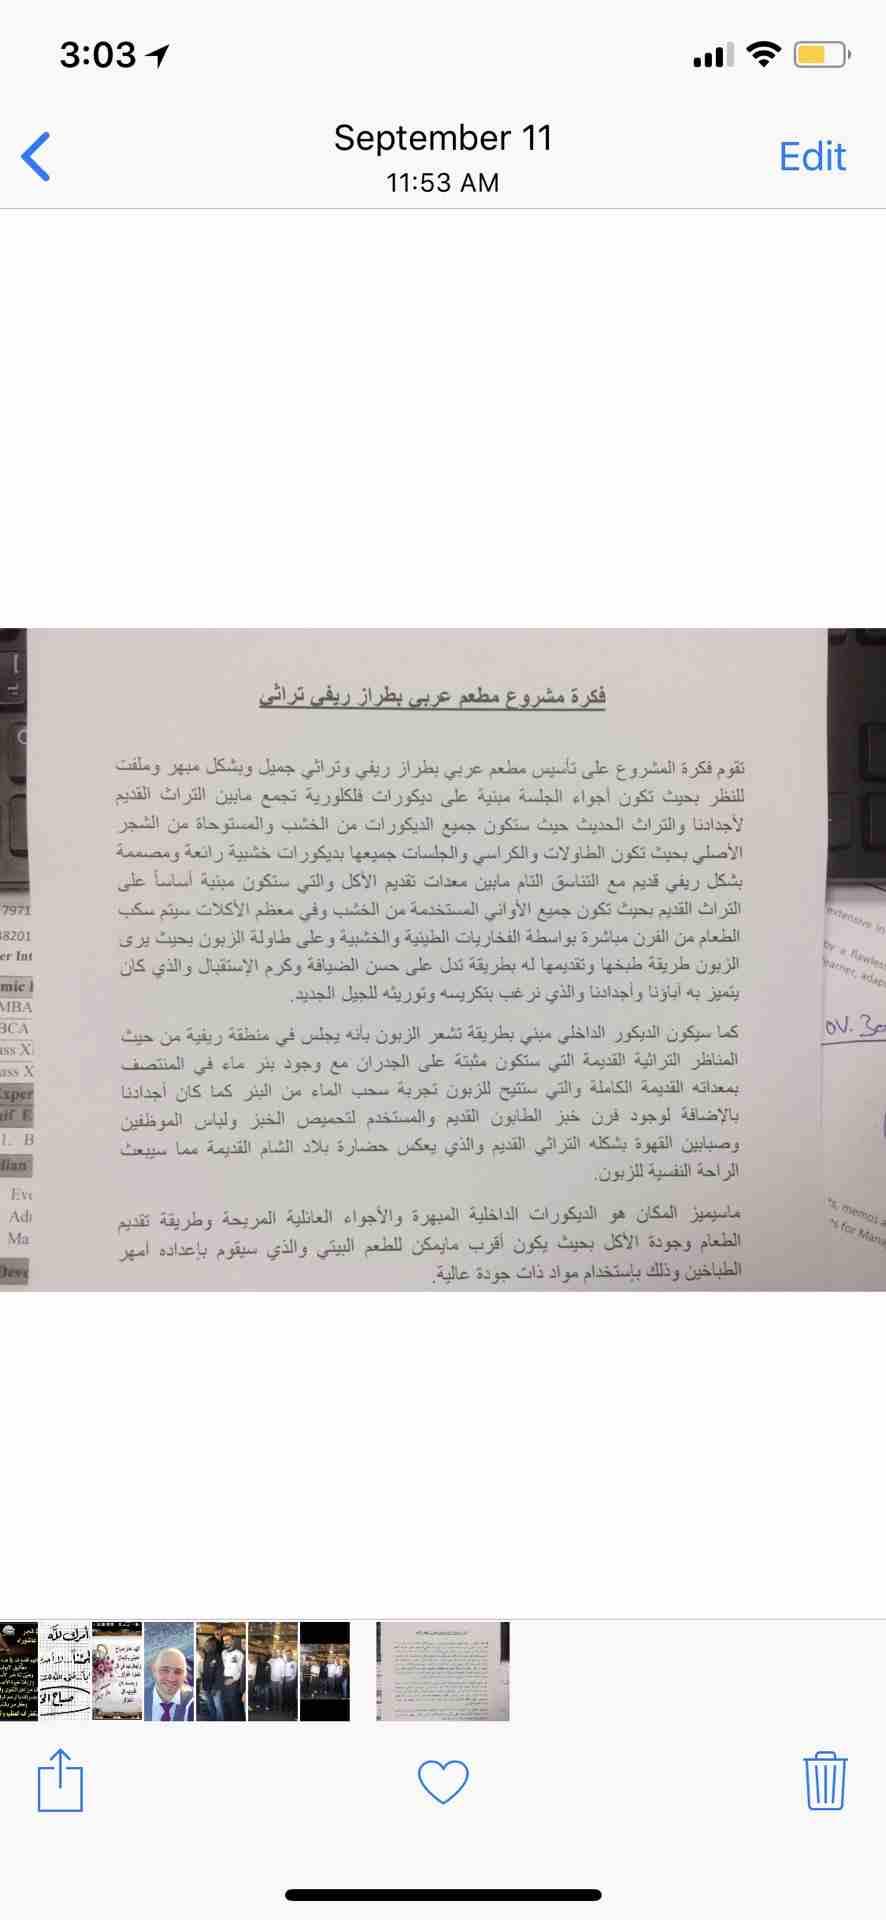 SounDXB للترجمة الفورية في دبي SounDXB هي مجموعة مشهورة من مزودي الخدمات في دبي التي تشتهر بخدم-  الرجاء القراءه بشكل كامل...